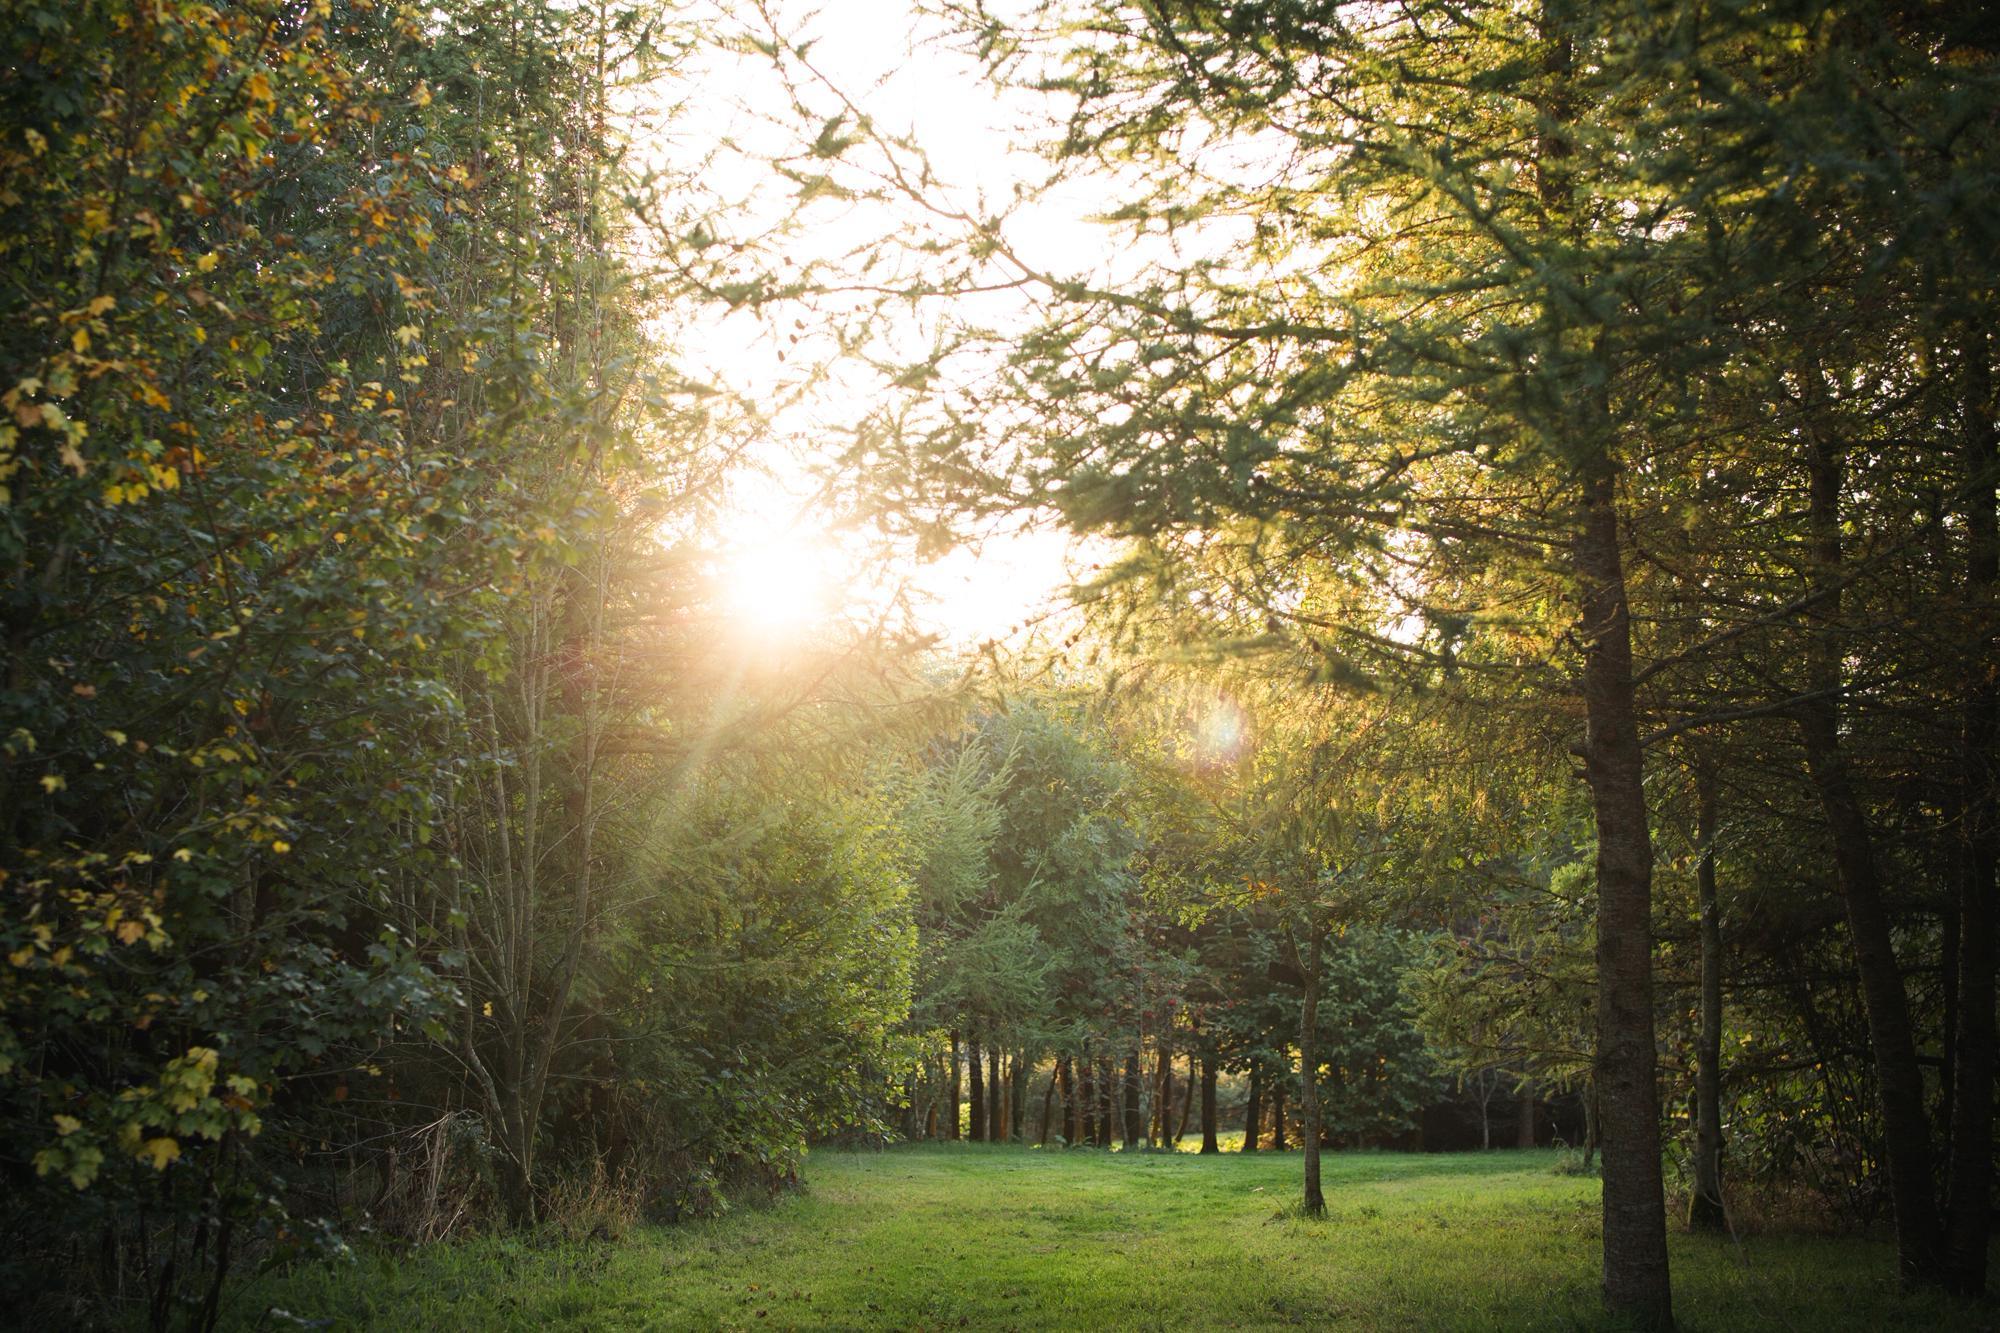 Pembroke Camping | Best campsites in Pembroke, Pembrokeshire